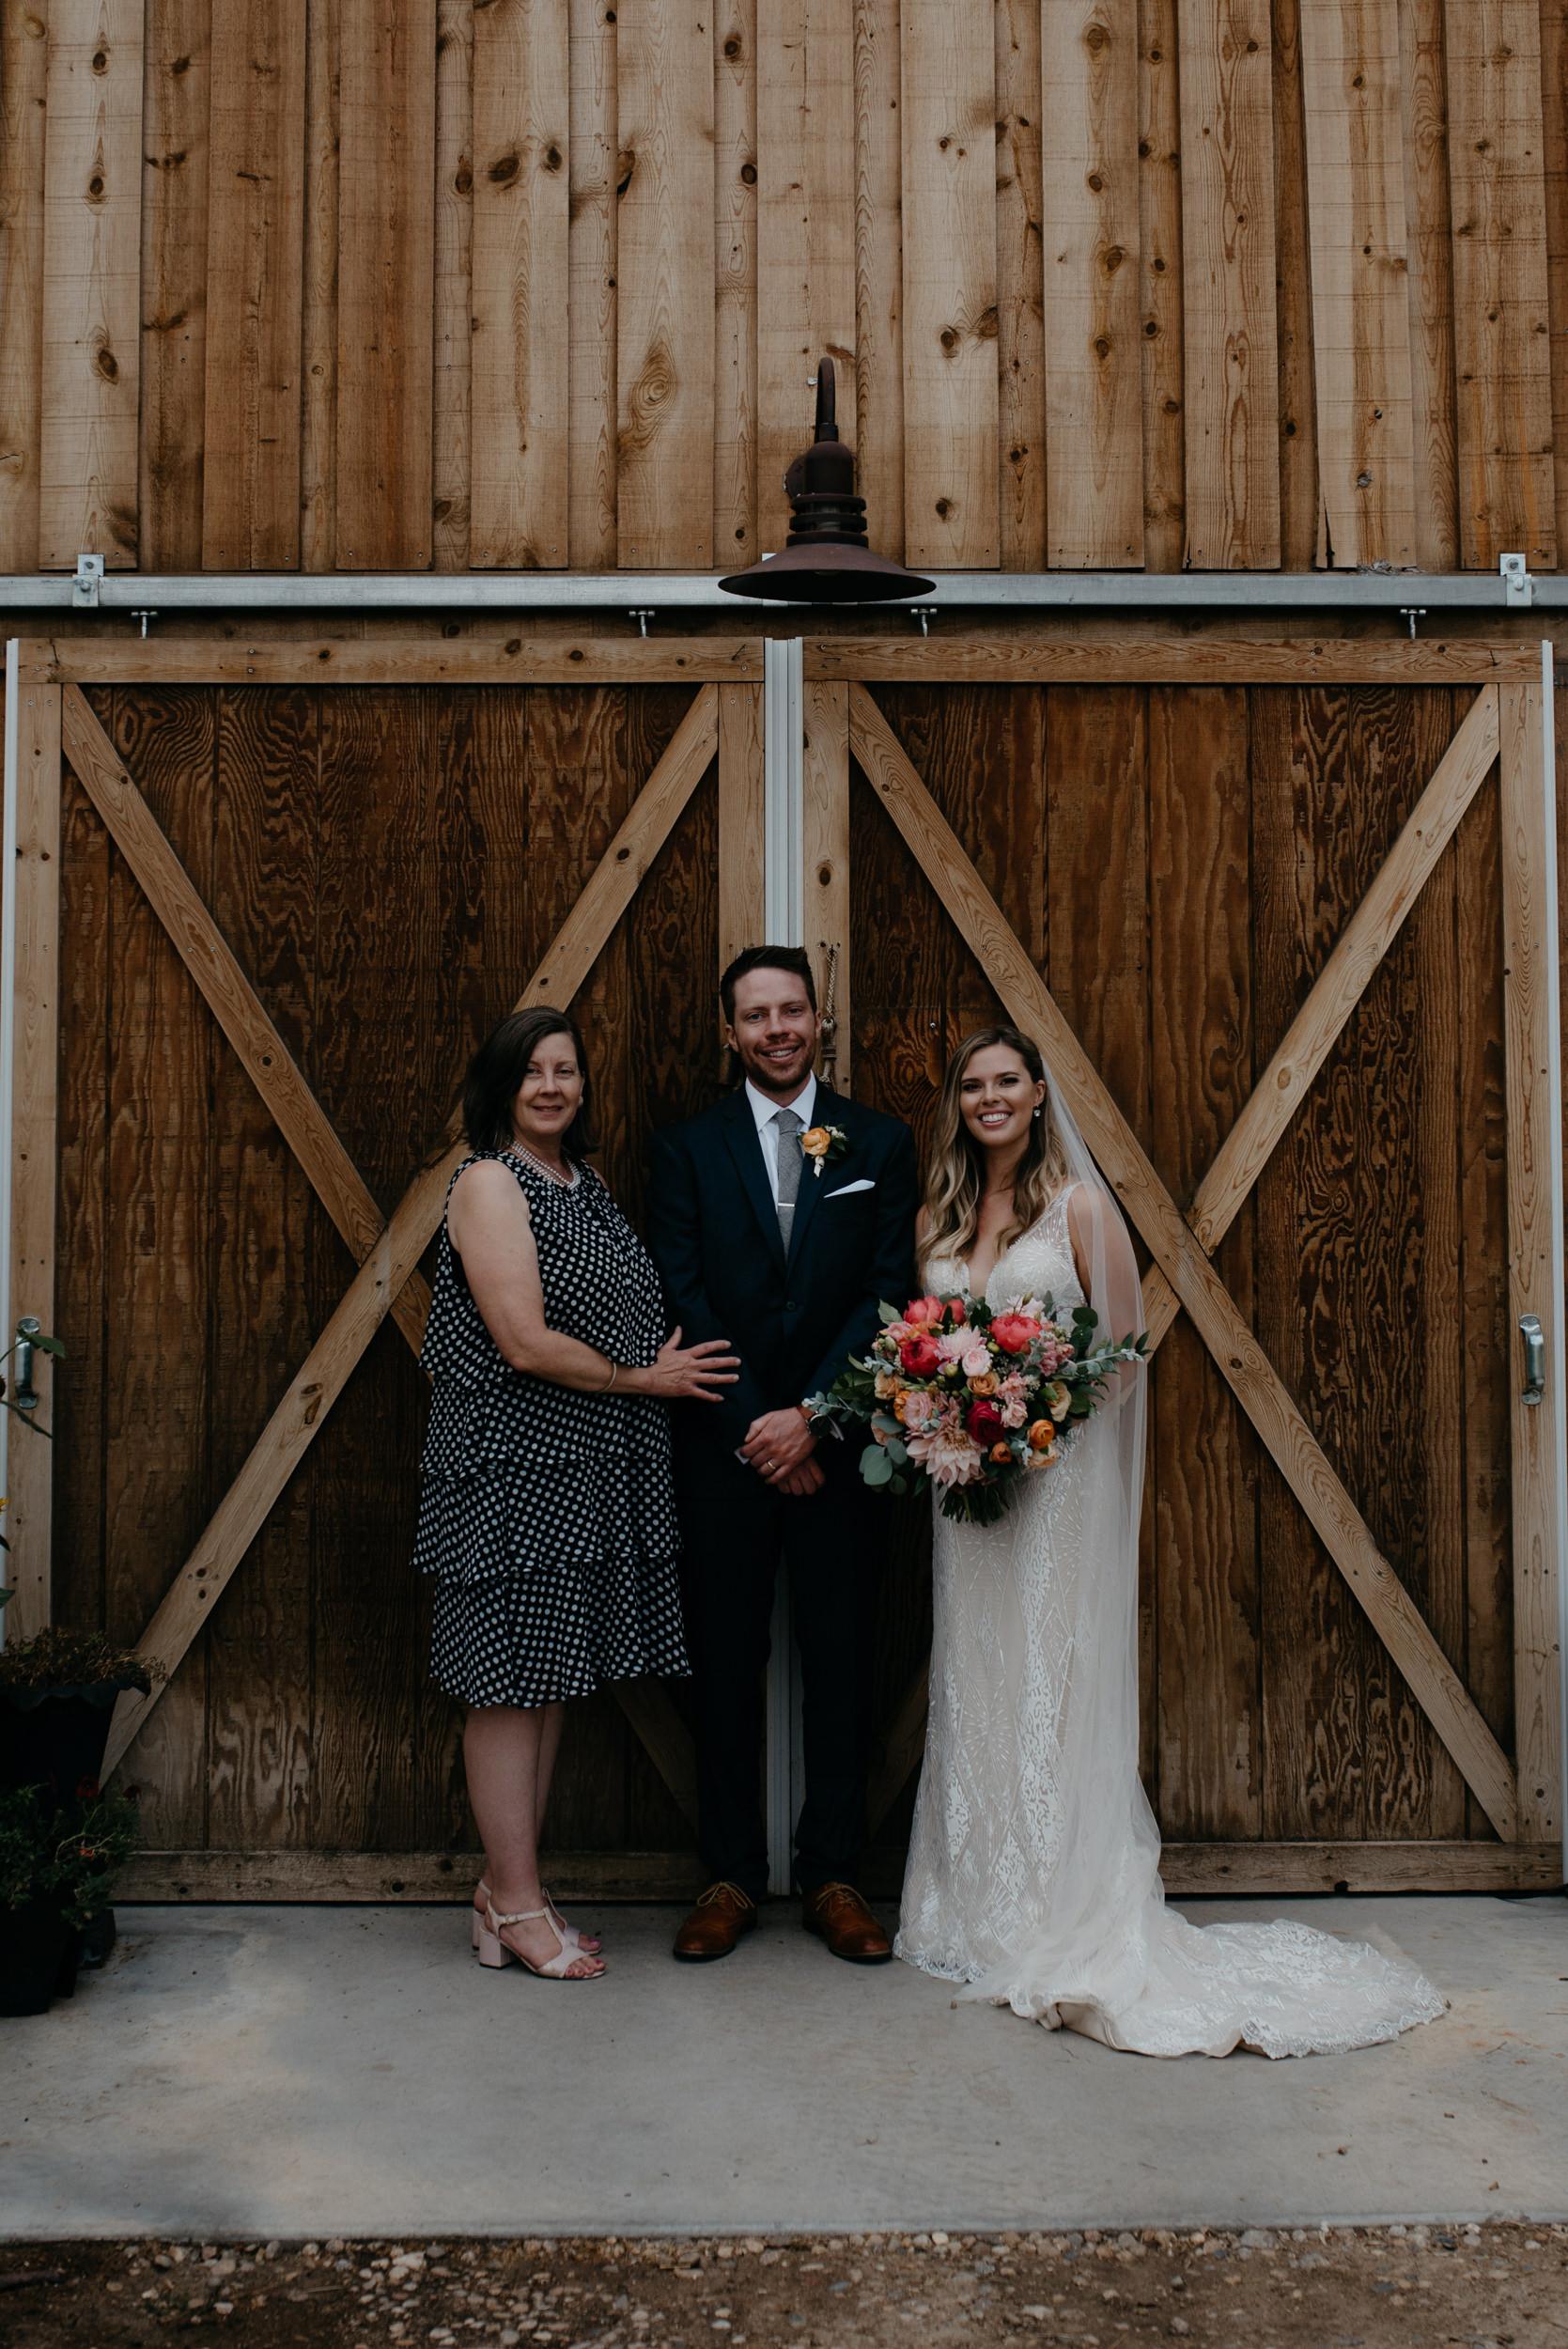 Family photos at intimate Boulder wedding. Colorado wedding and elopement photographer.